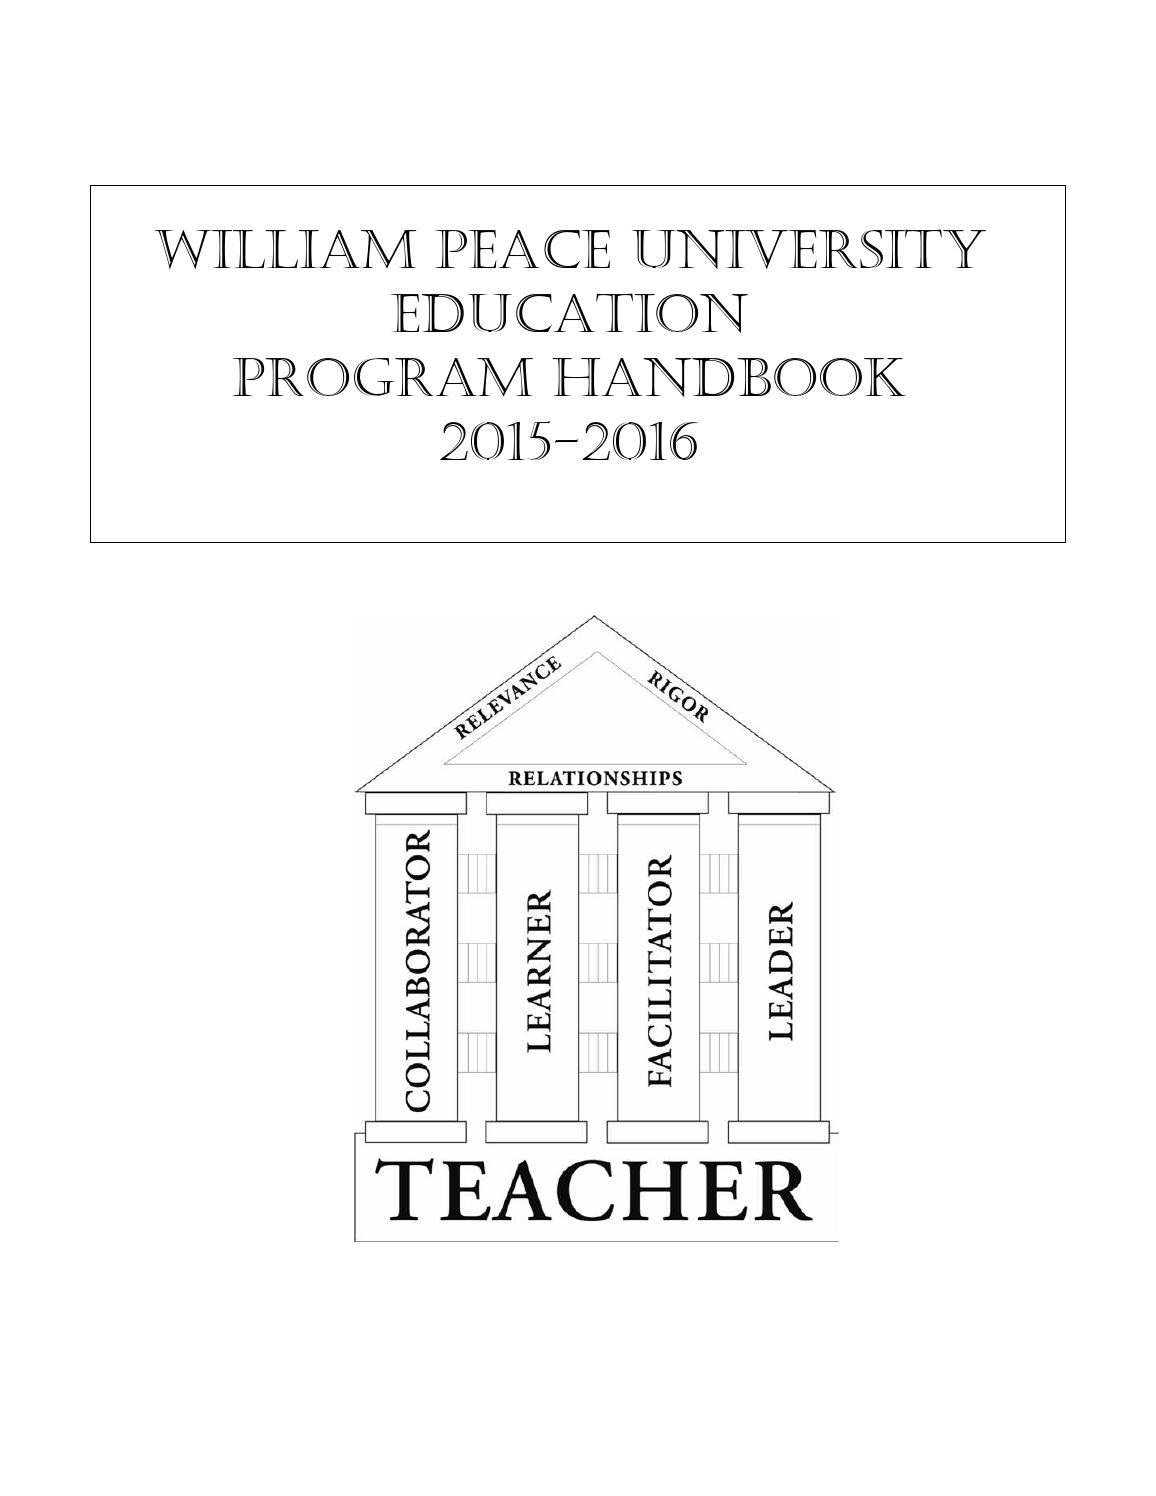 WPU Education Program Handbook 2015-16 by William Peace